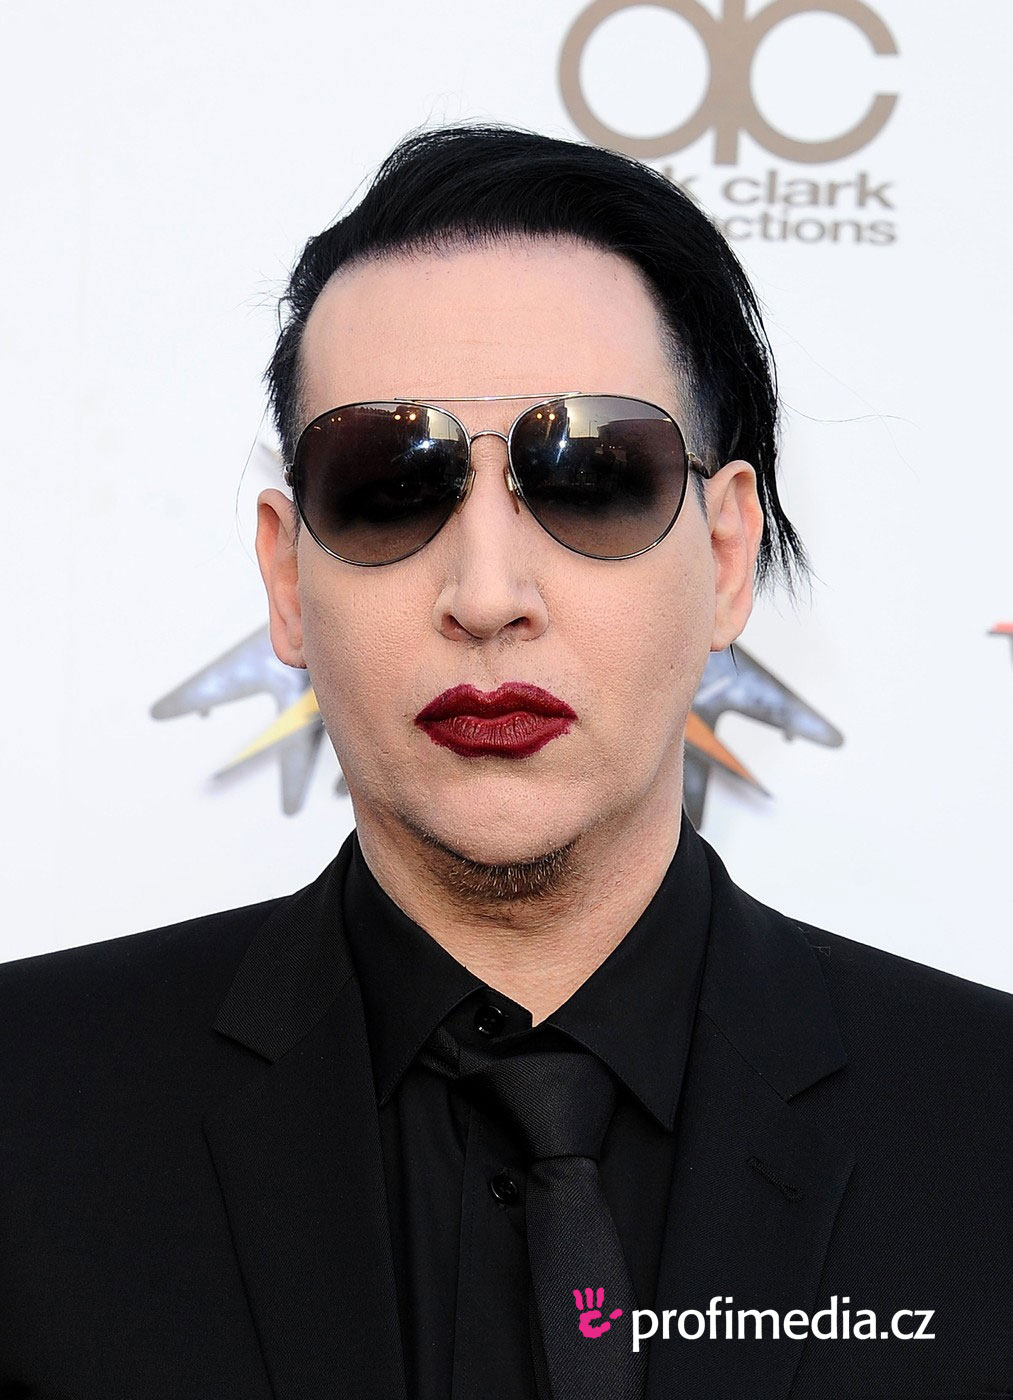 Marilyn Manson Hairstyle Easyhairstyler